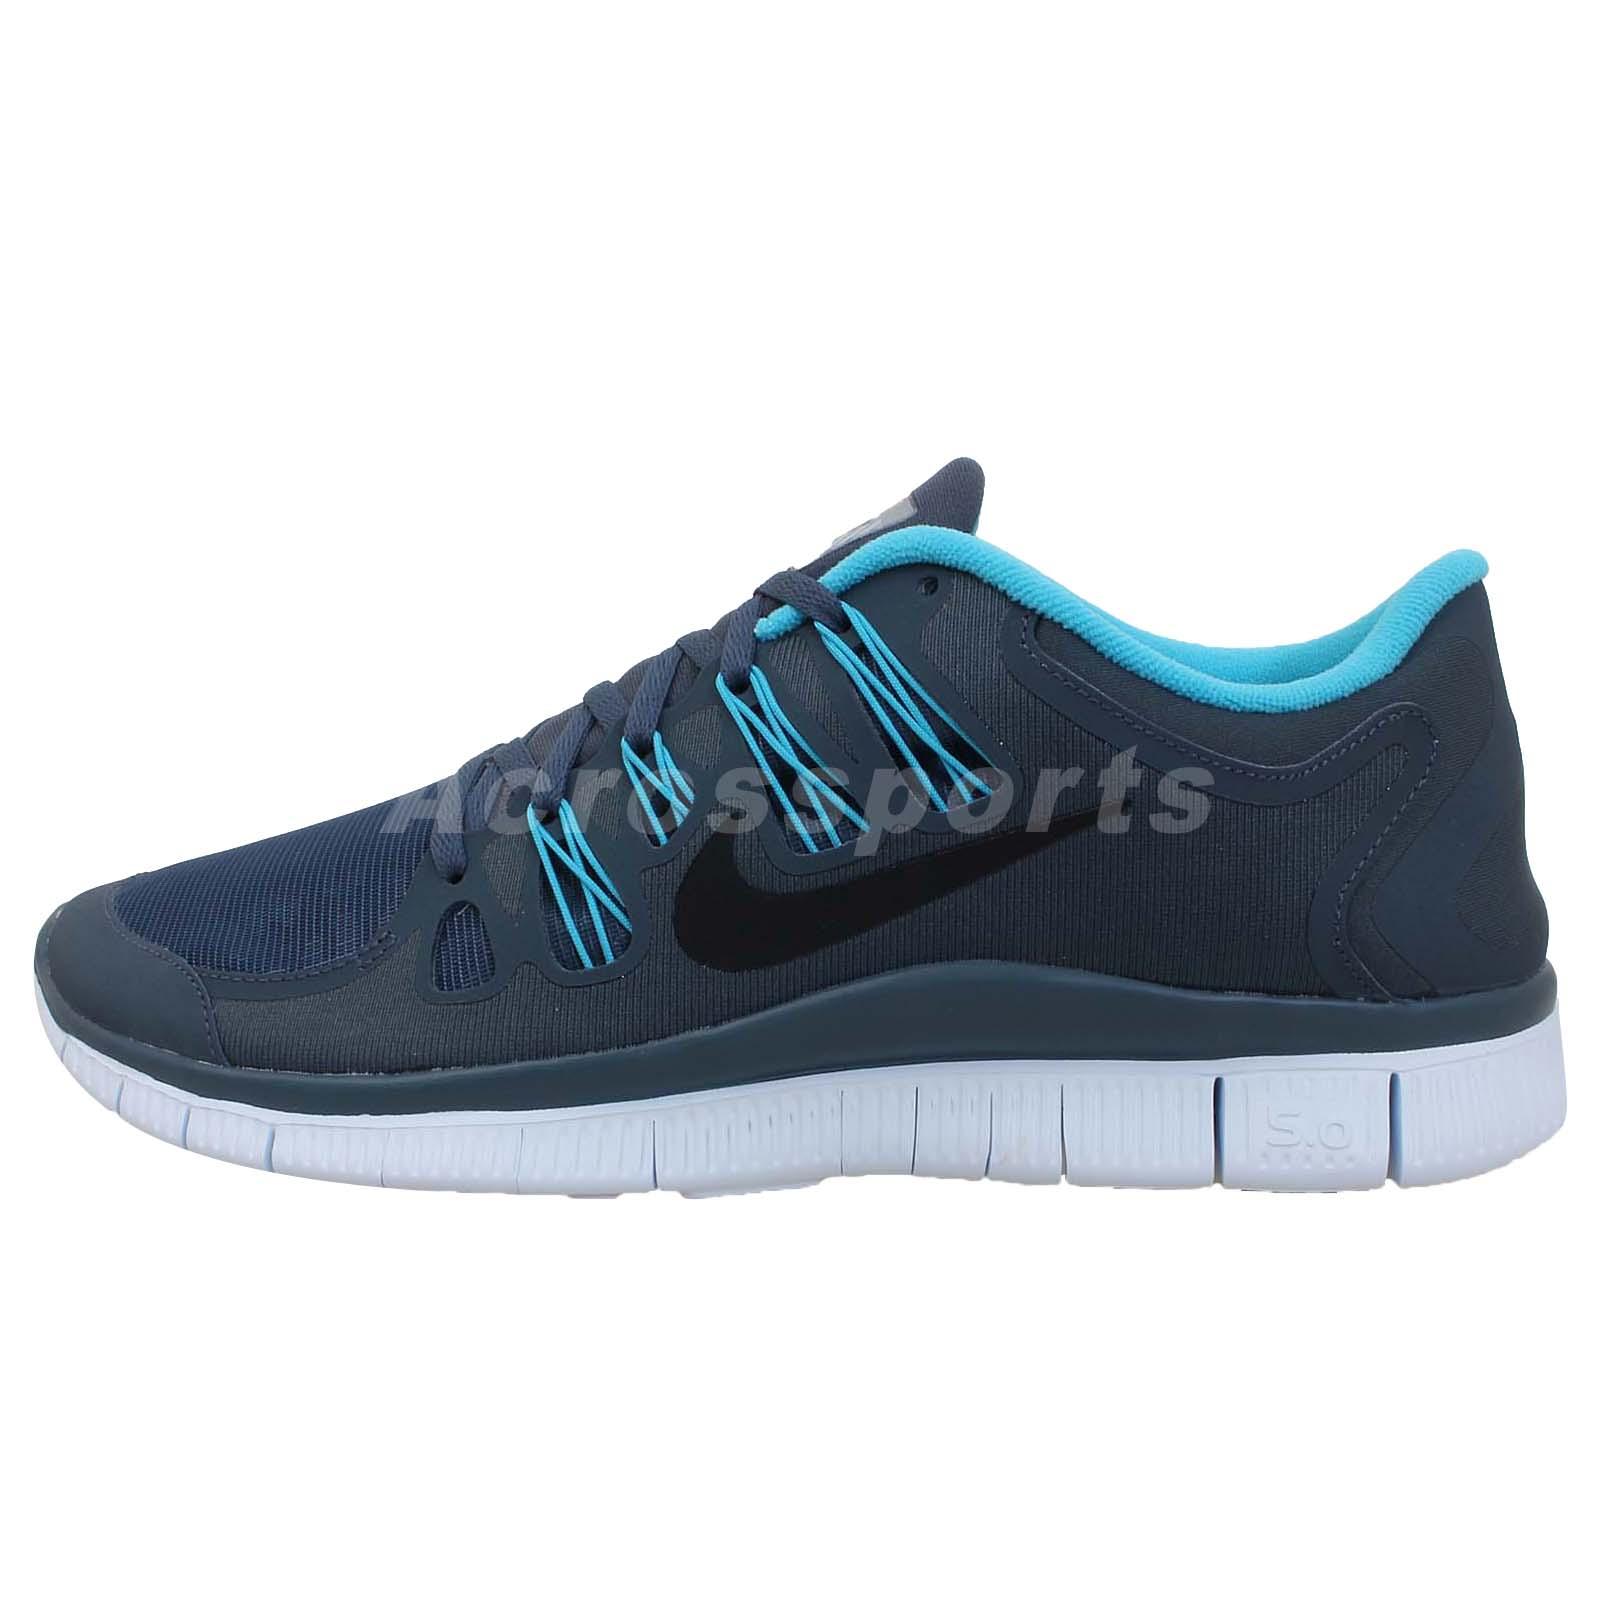 Nike Running Shoes 2013 Nike free 5.0 run